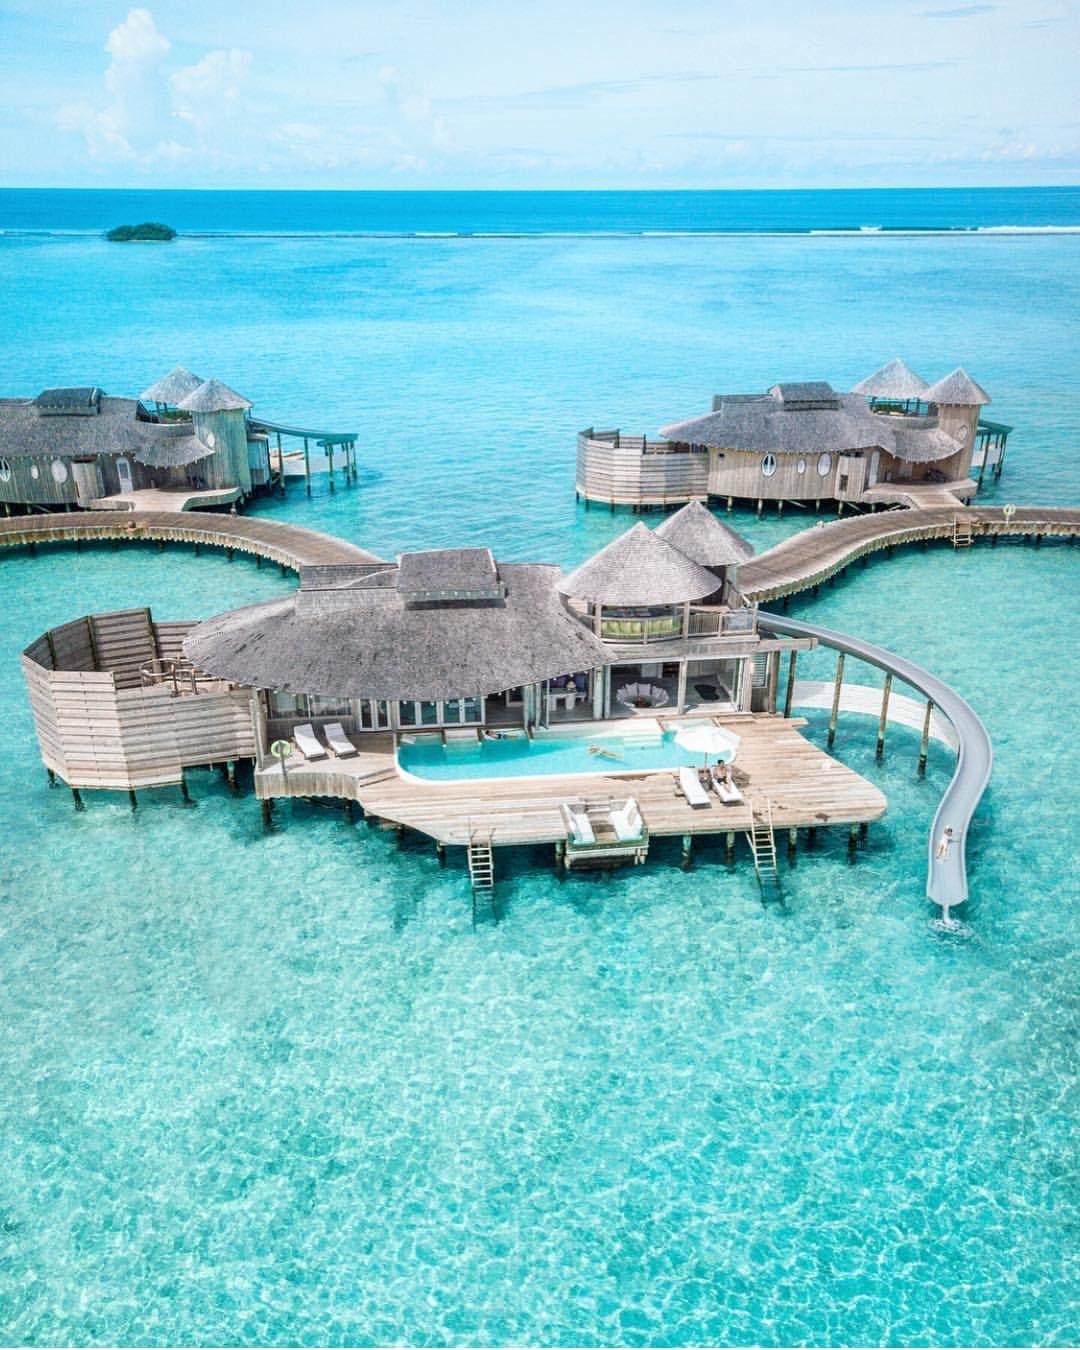 Soneva Jani Noonu Atoll Maldives Vacation Places Places To Travel Beautiful Places To Travel